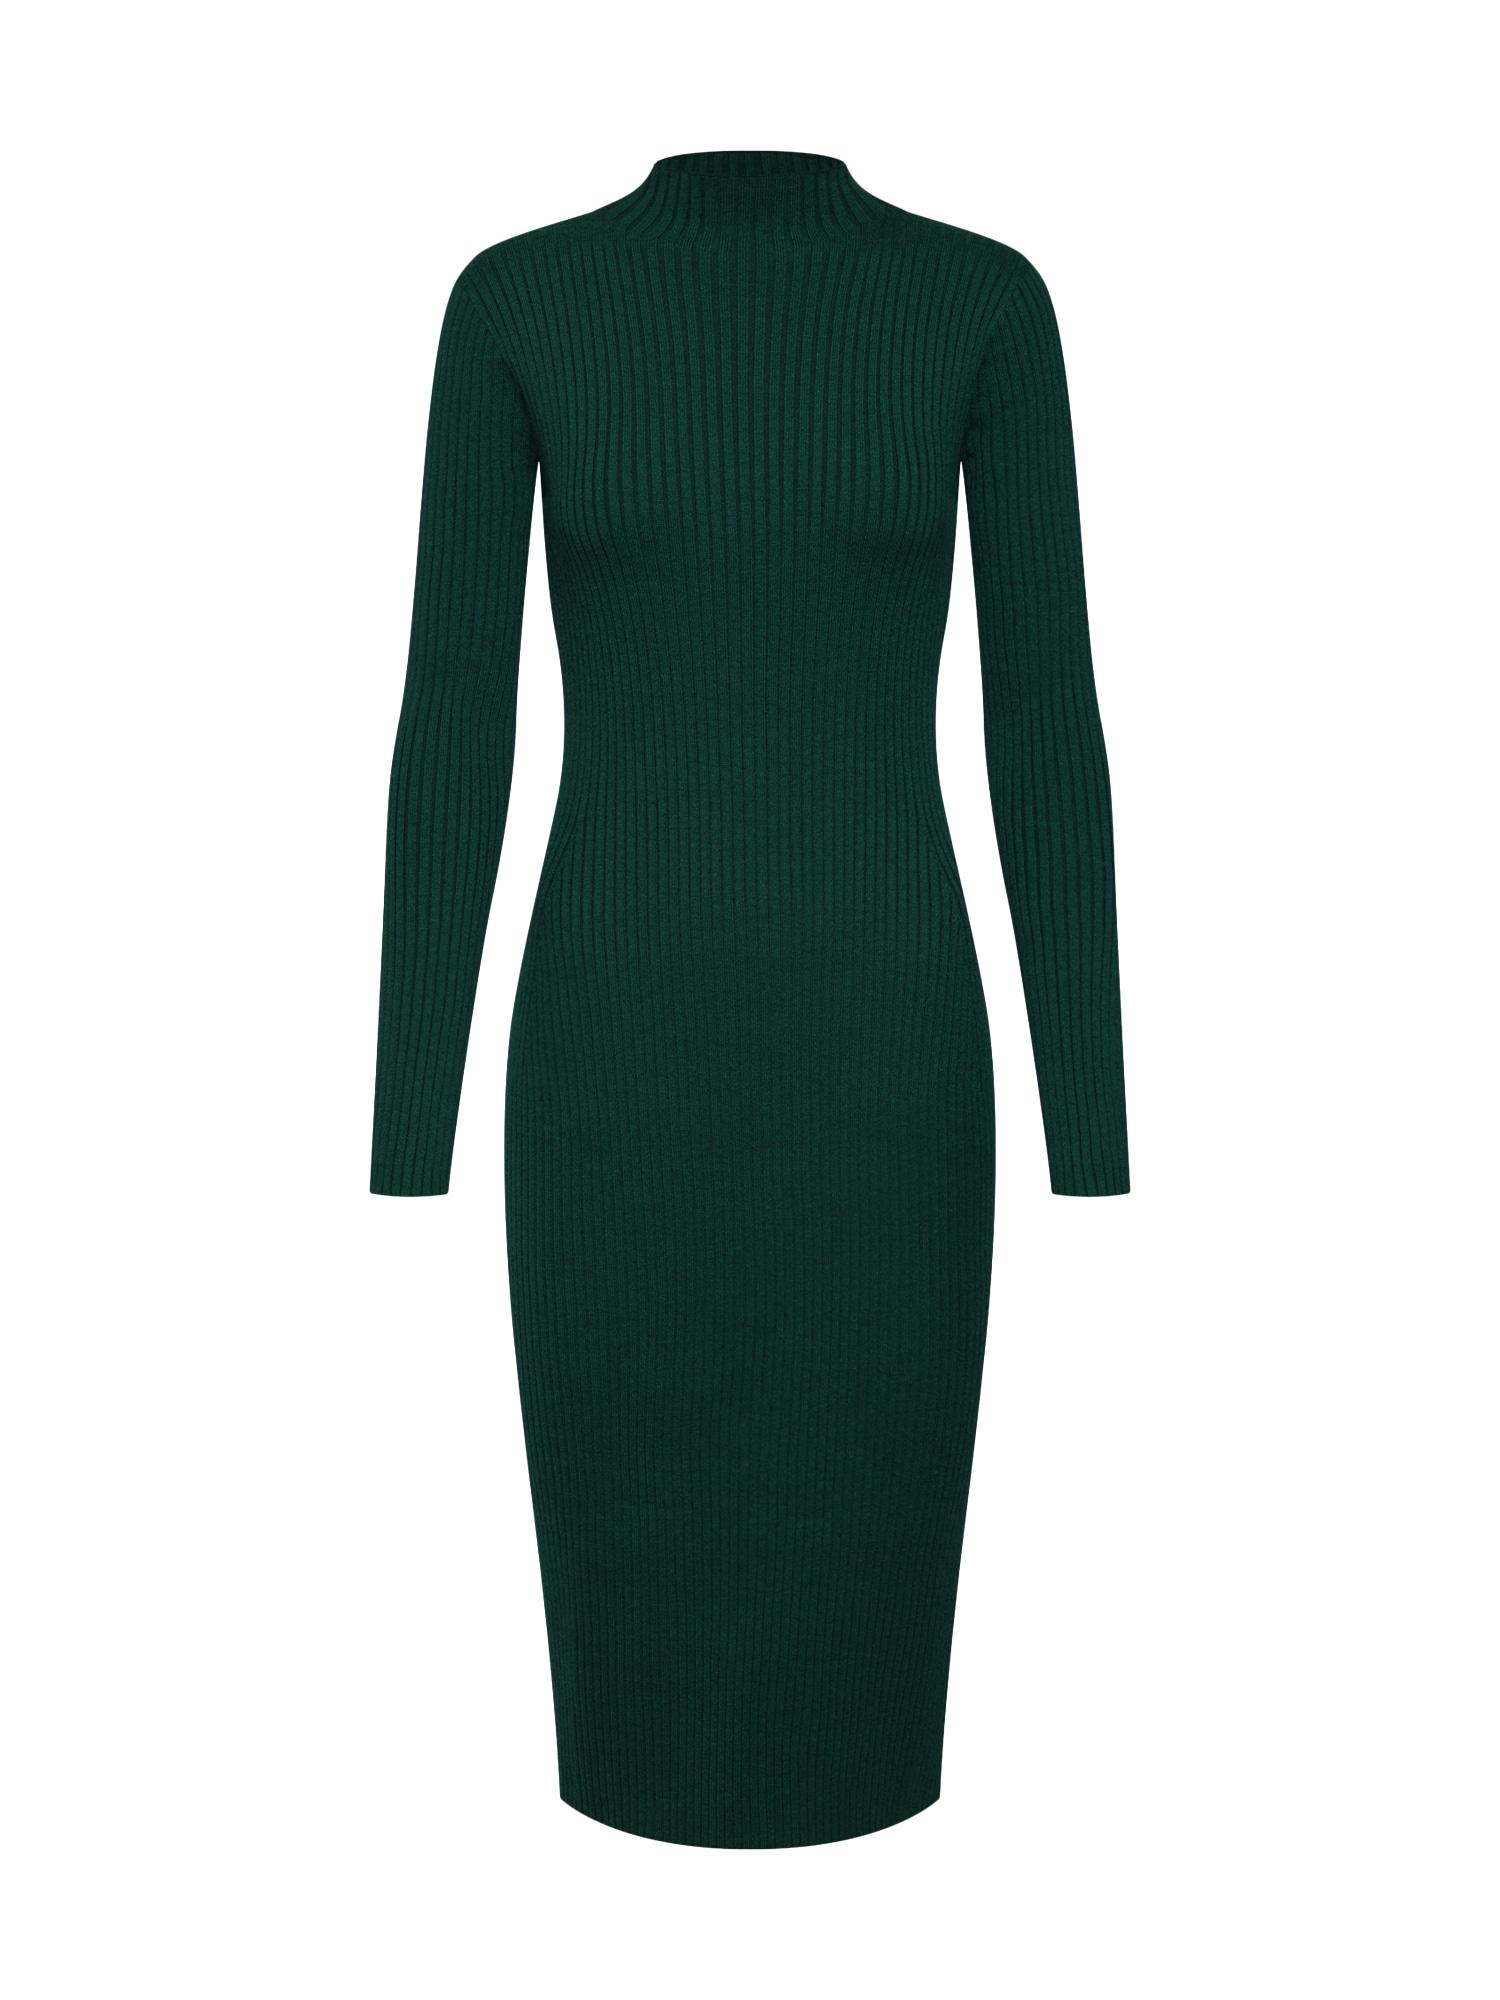 EDITED Megzta suknelė 'Hada' žalia / tamsiai žalia